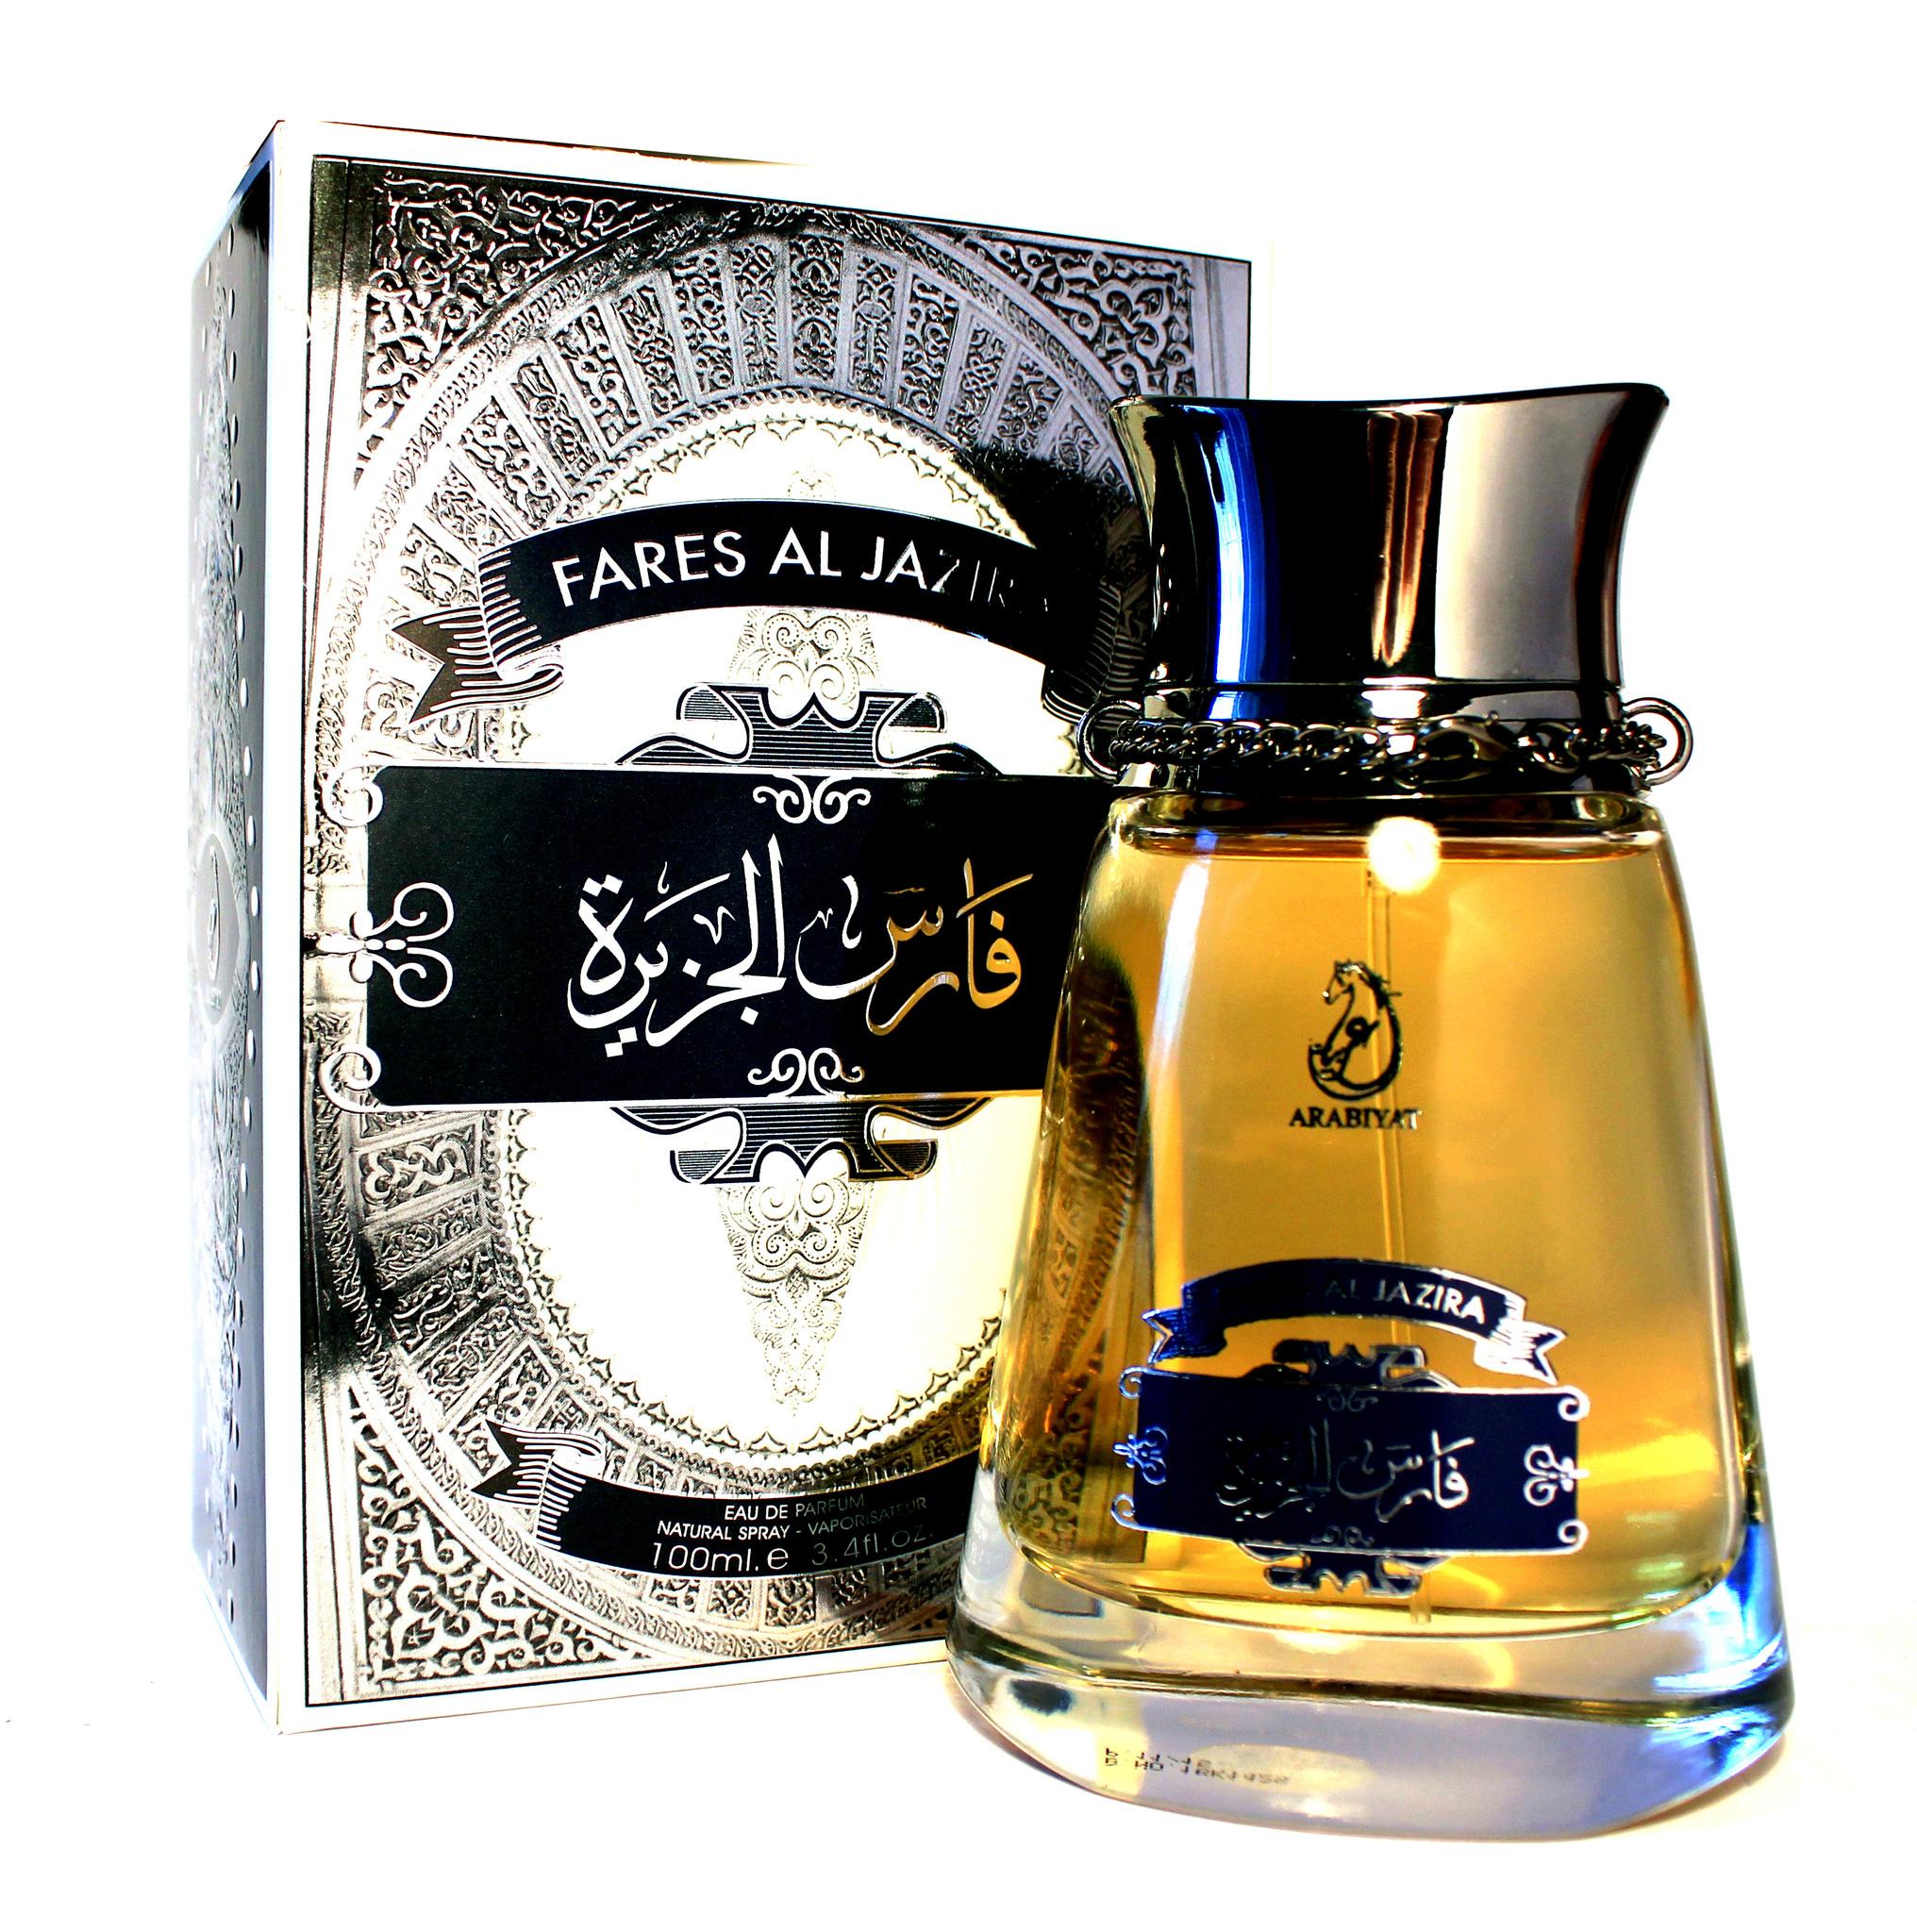 Fares Al Jazeera Фарес Аль Жазира 100 мл спрей от Май Парфюмс My Perfumes